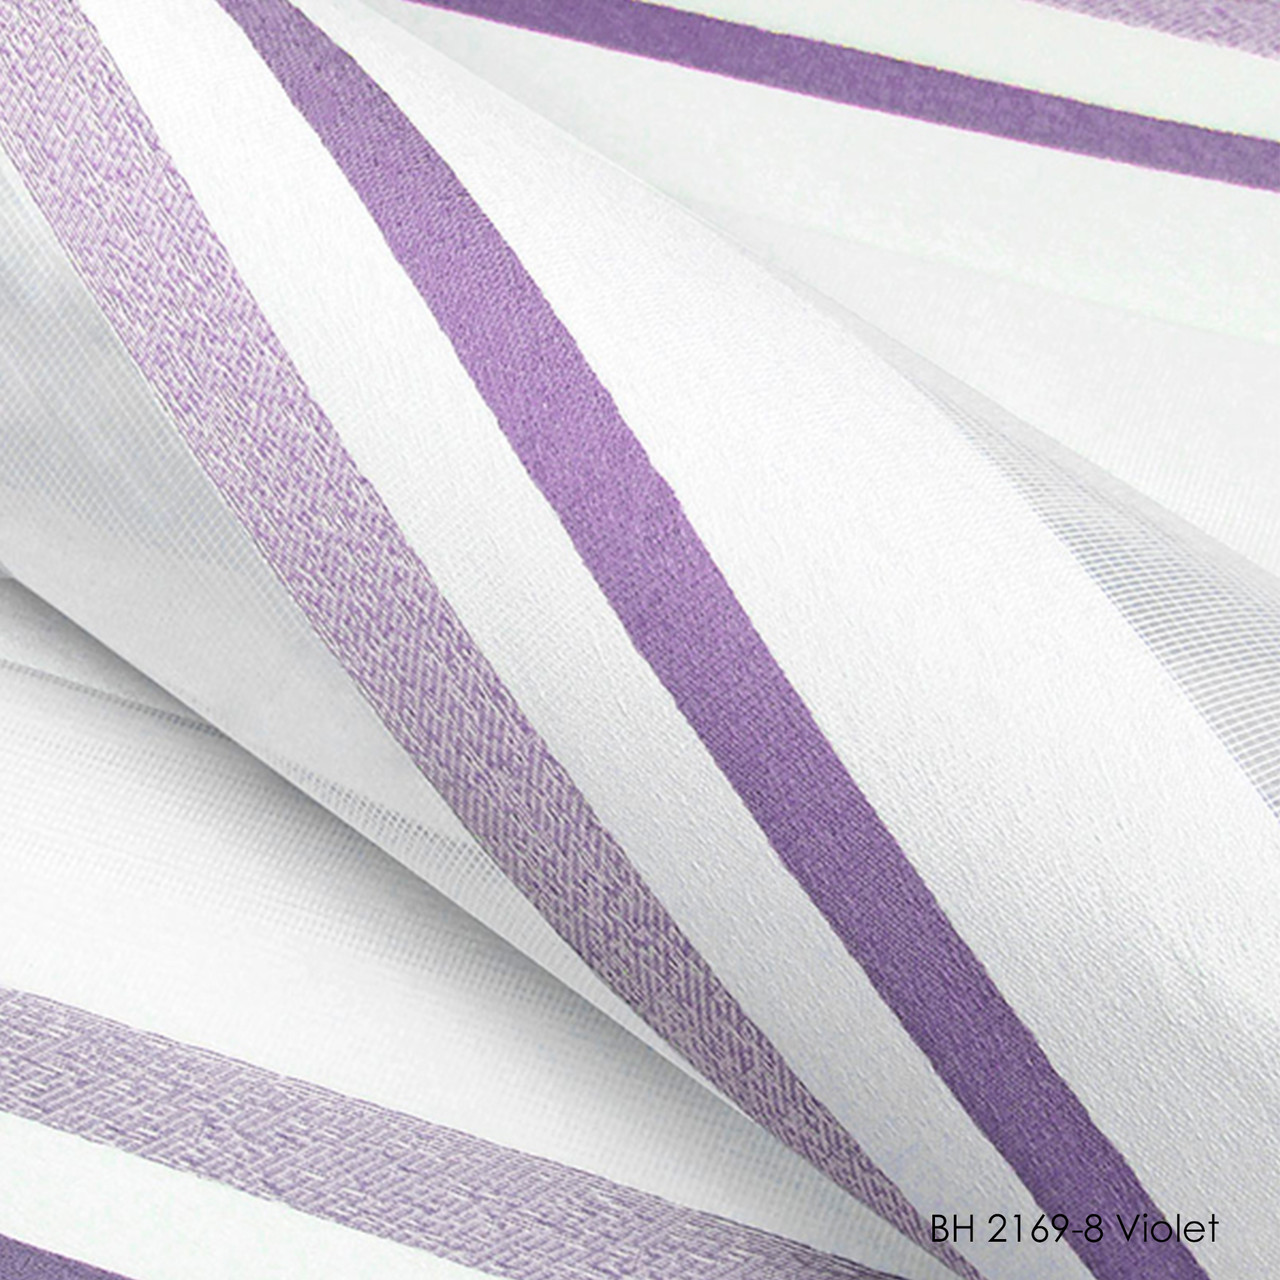 BH 2169-8 Violet